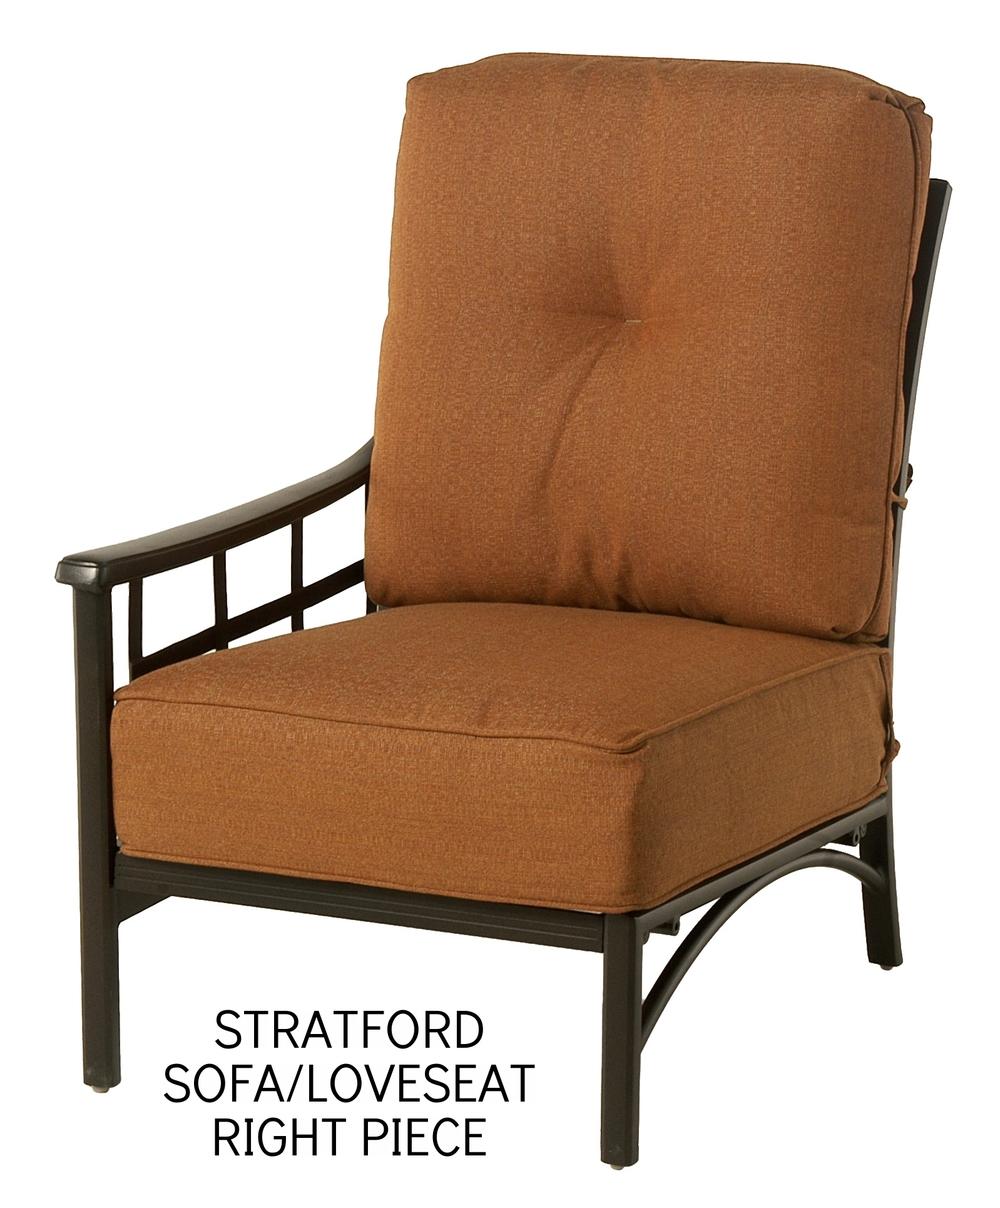 Stratford Estate Love Seat Club Right Chair.jpg